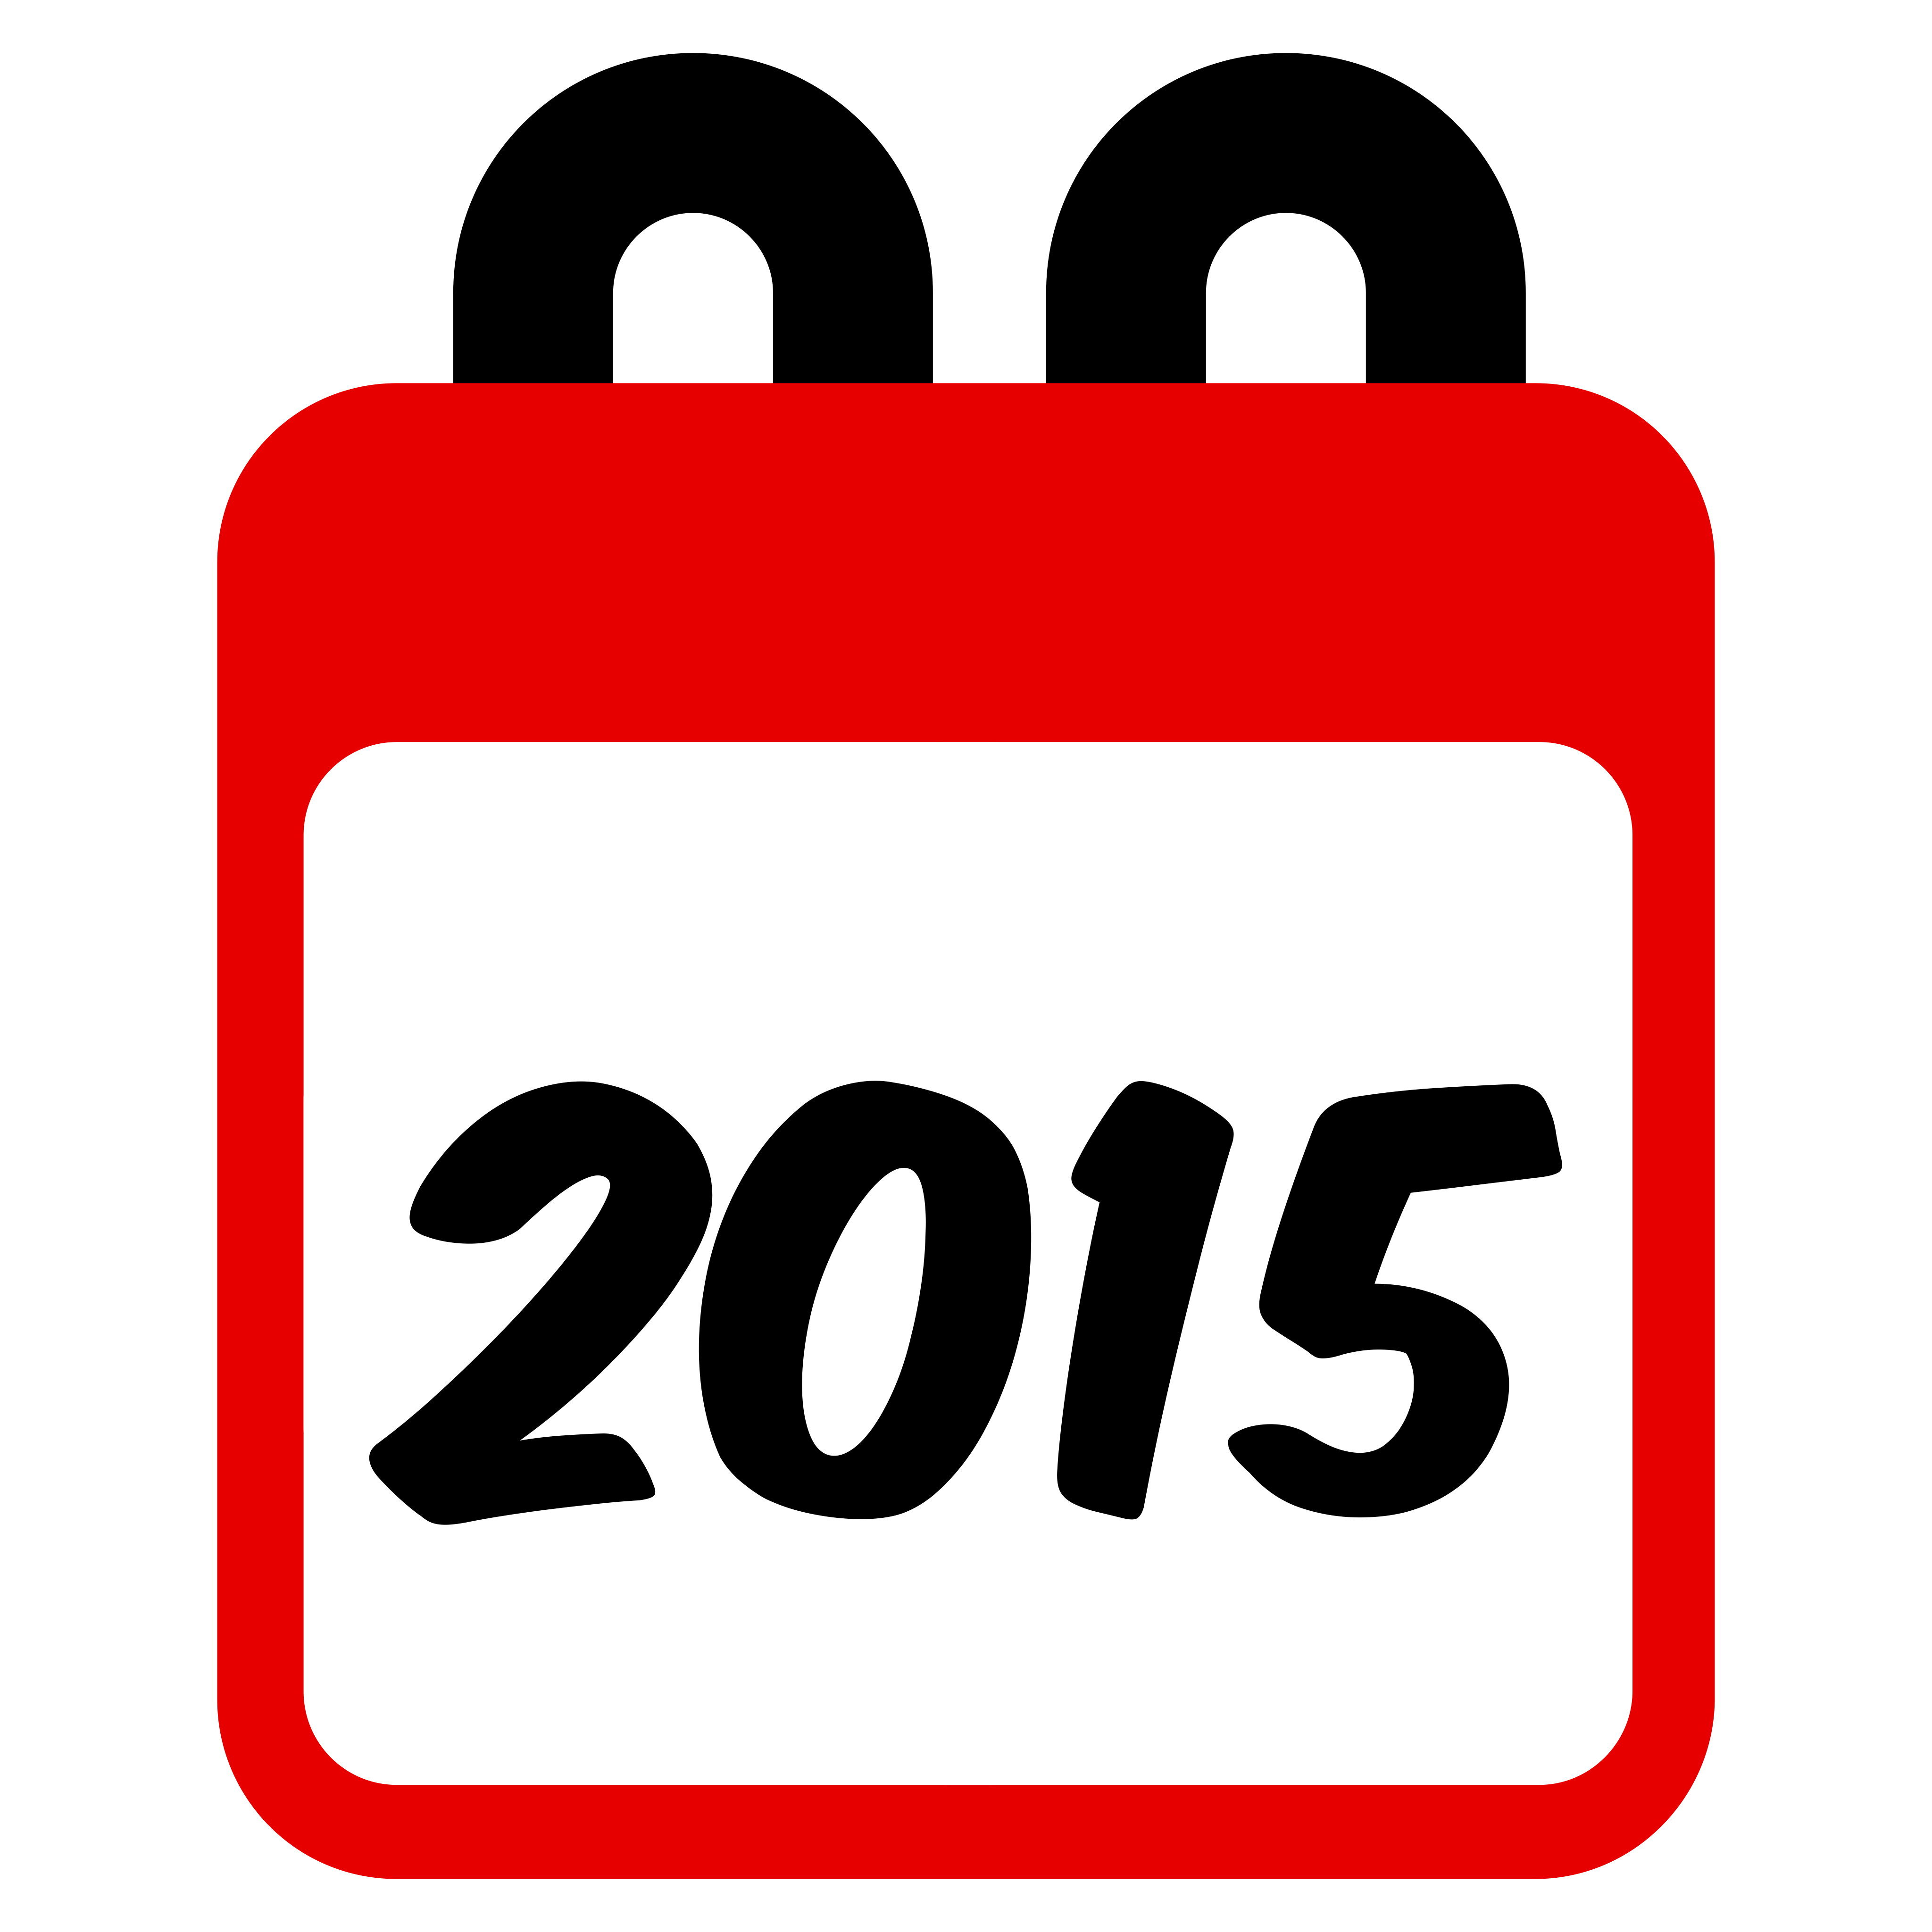 2015 Calendar Graphic